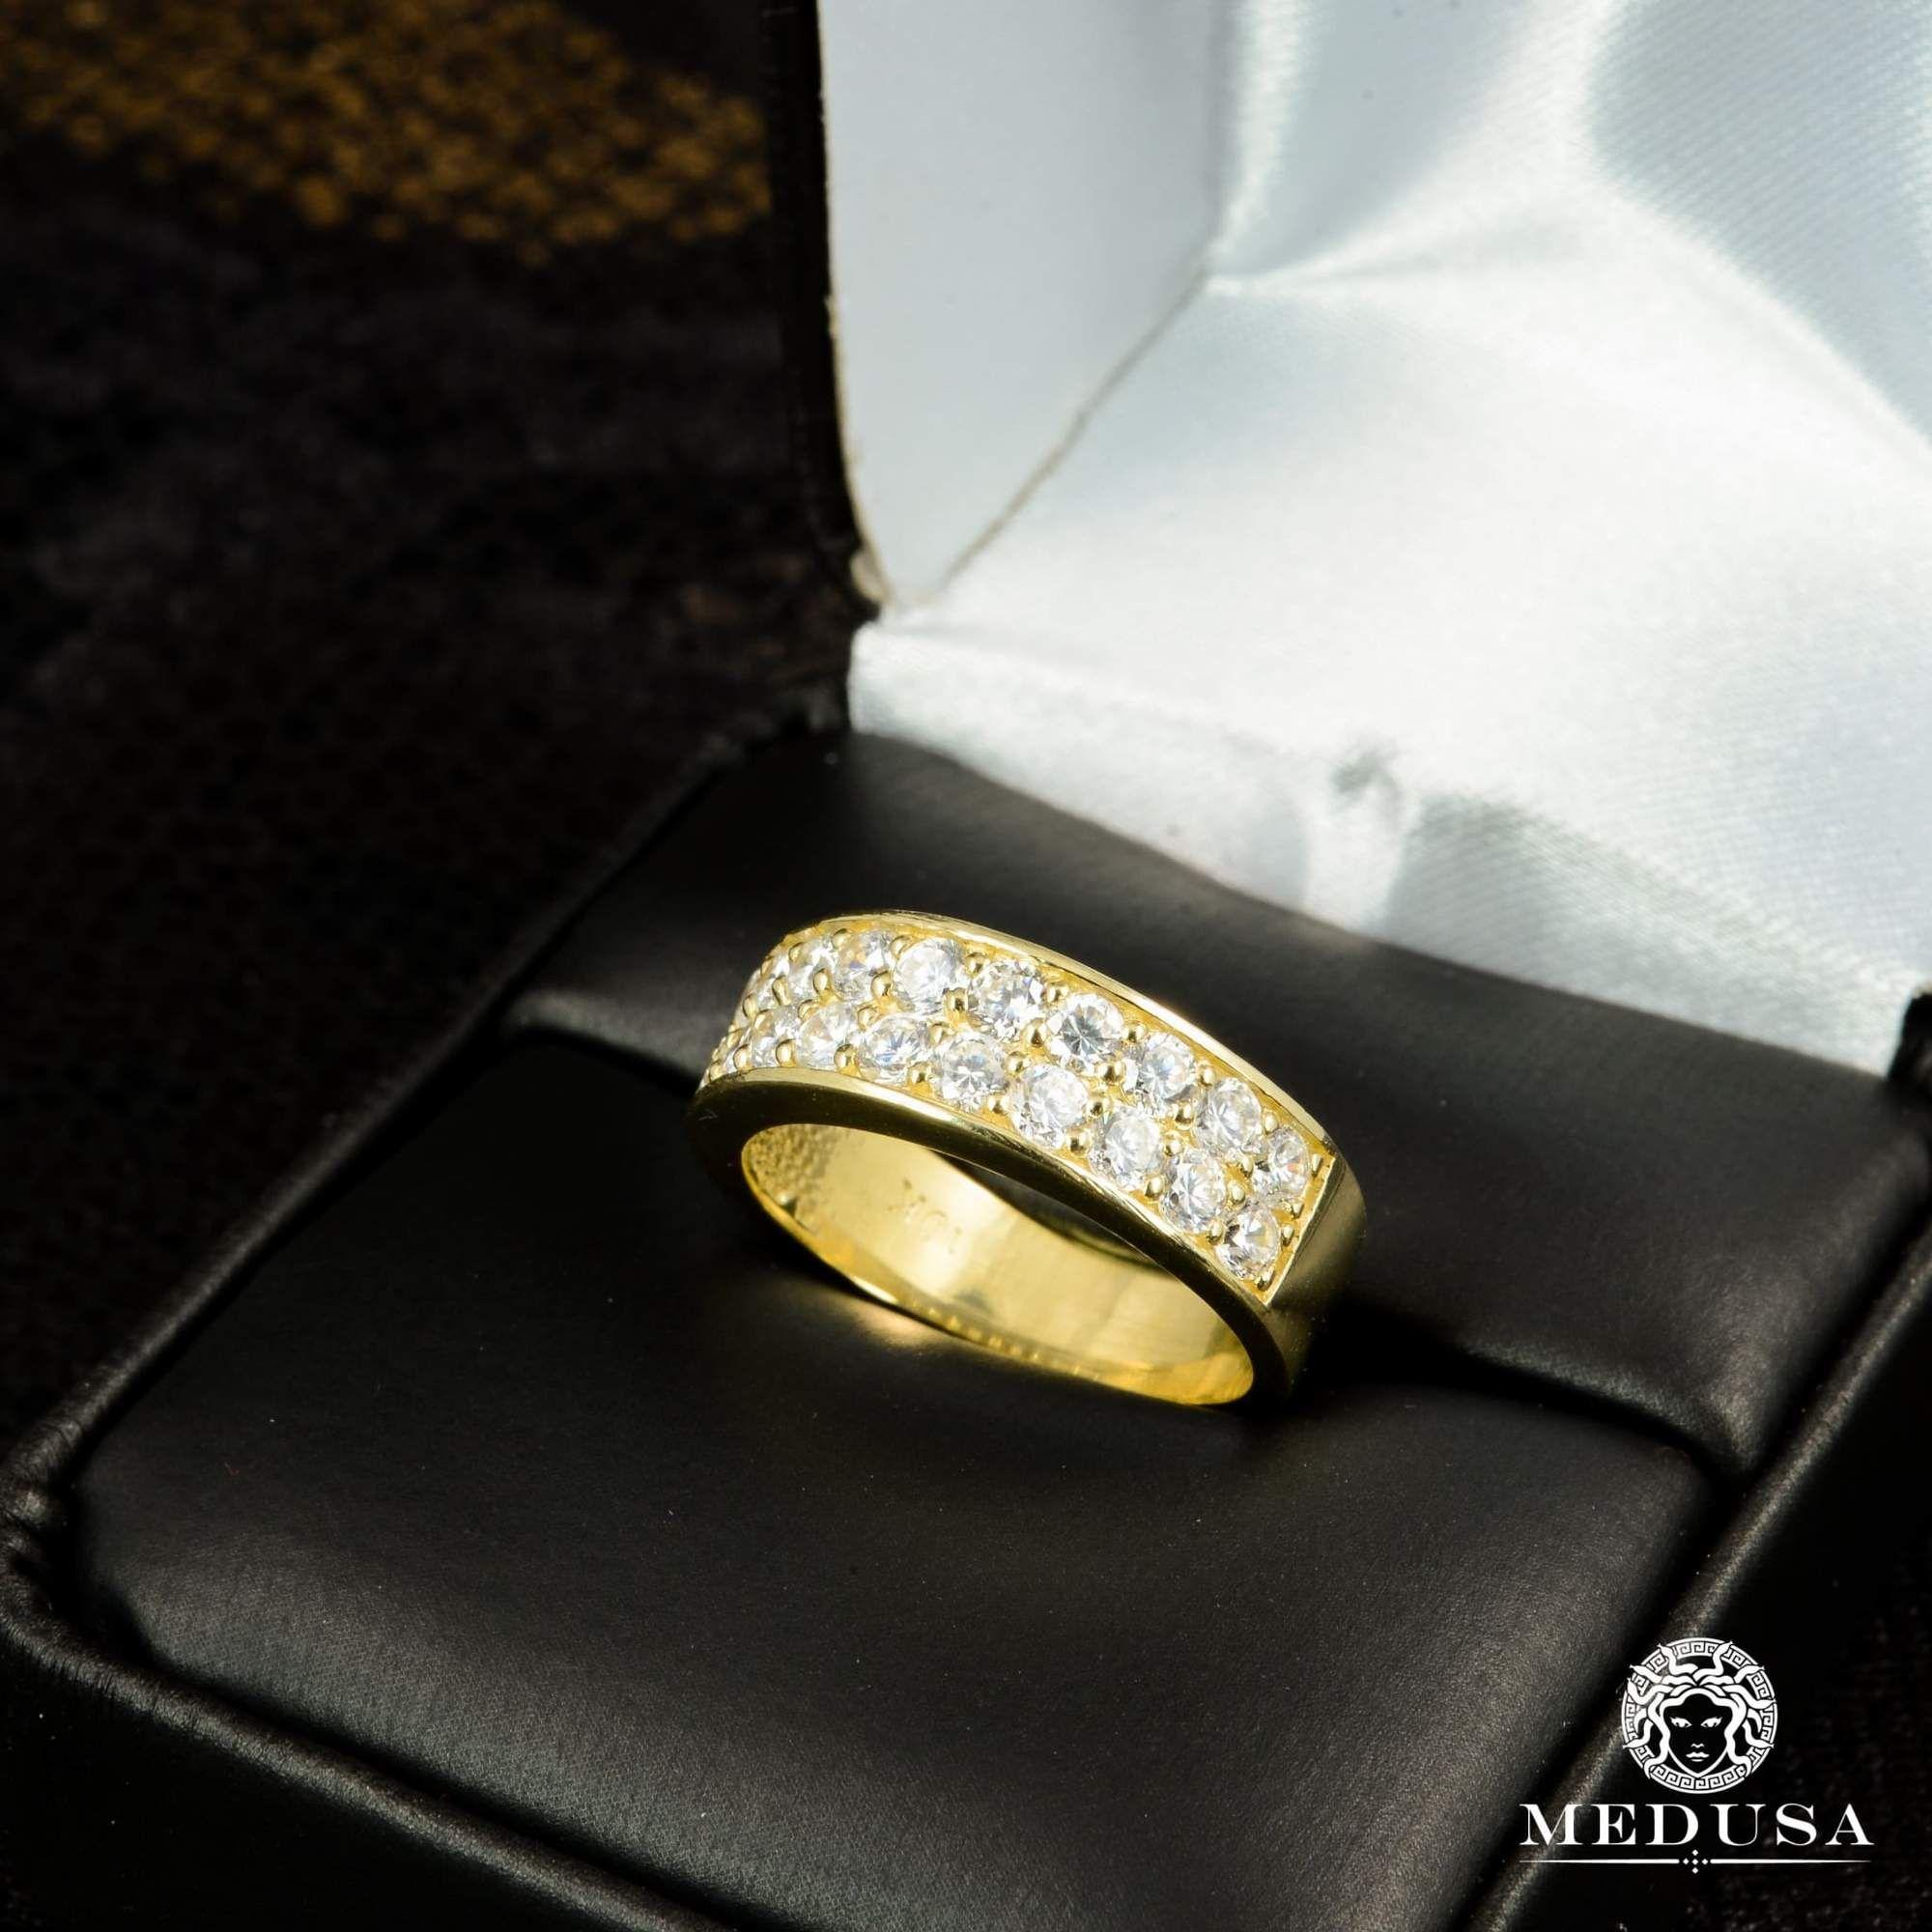 Trinity F12 Ma0721 Titanium Rings Rings For Men Rings